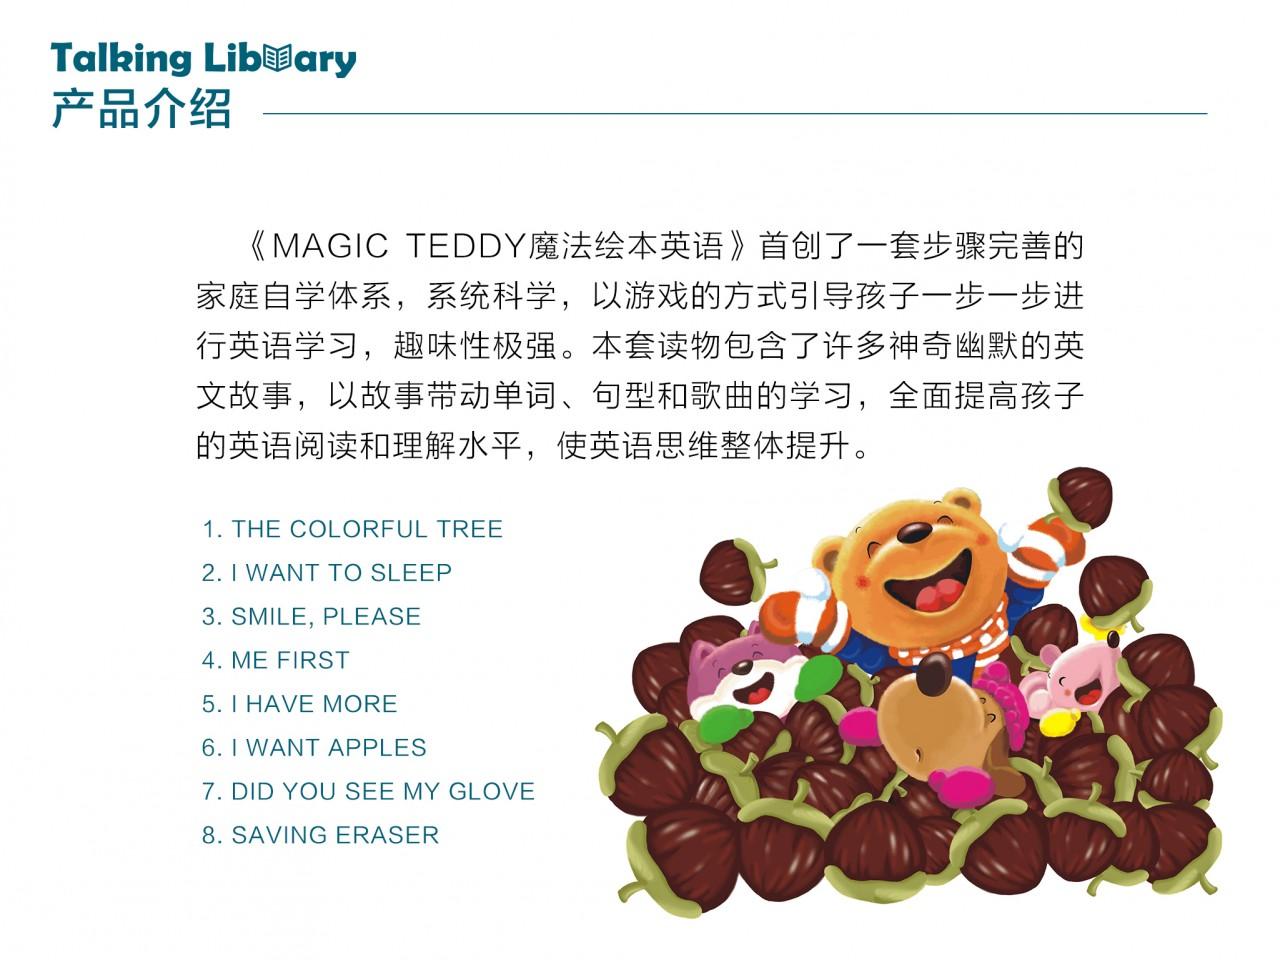 21-1Magic Teddy 洪恩国际幼儿英语(全套) 产品介绍